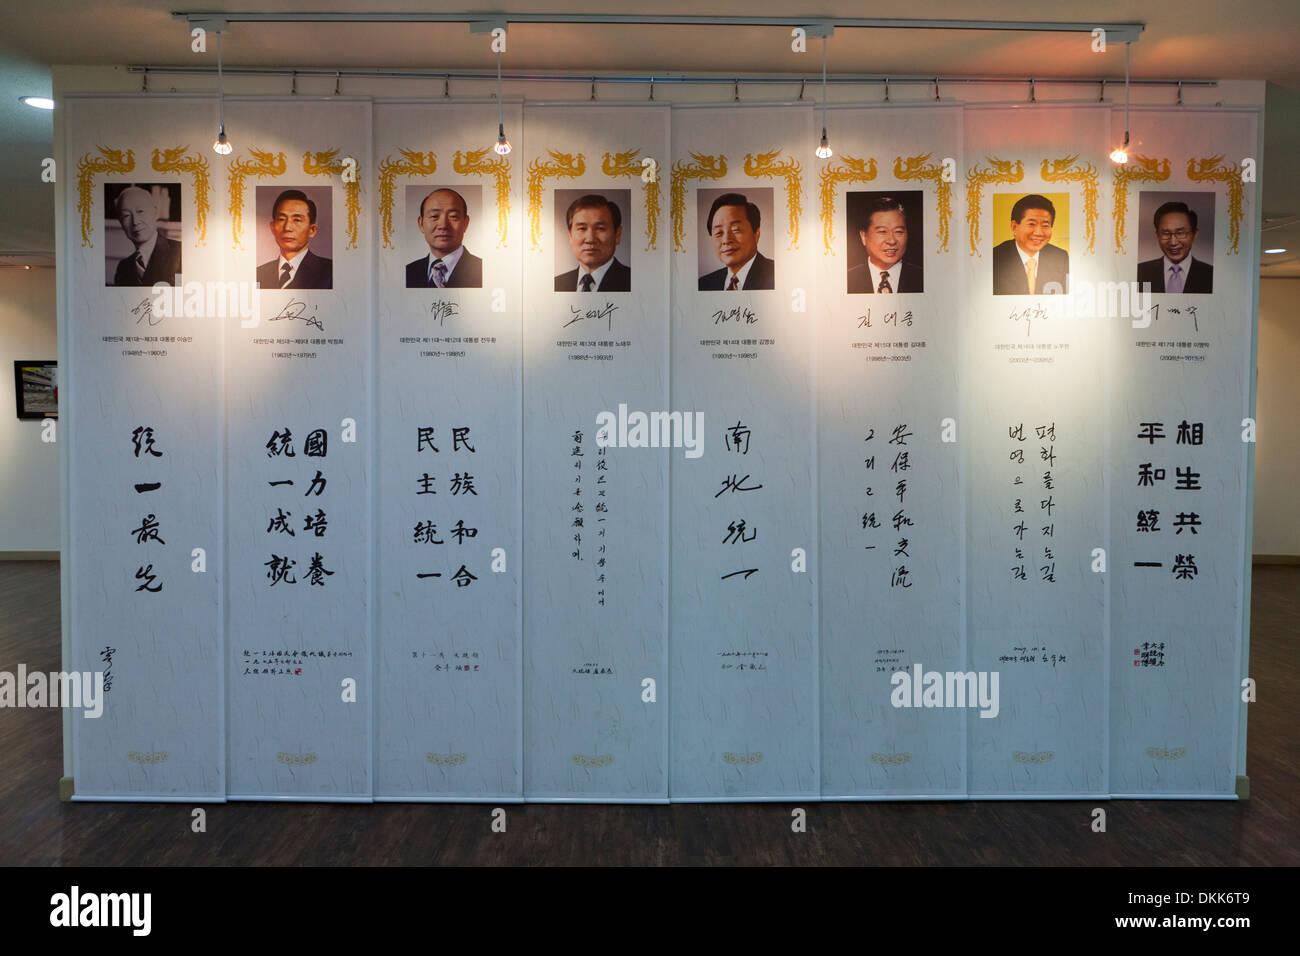 List of Korean presidents, up to 2012 - Seoul, South Korea - Stock Image